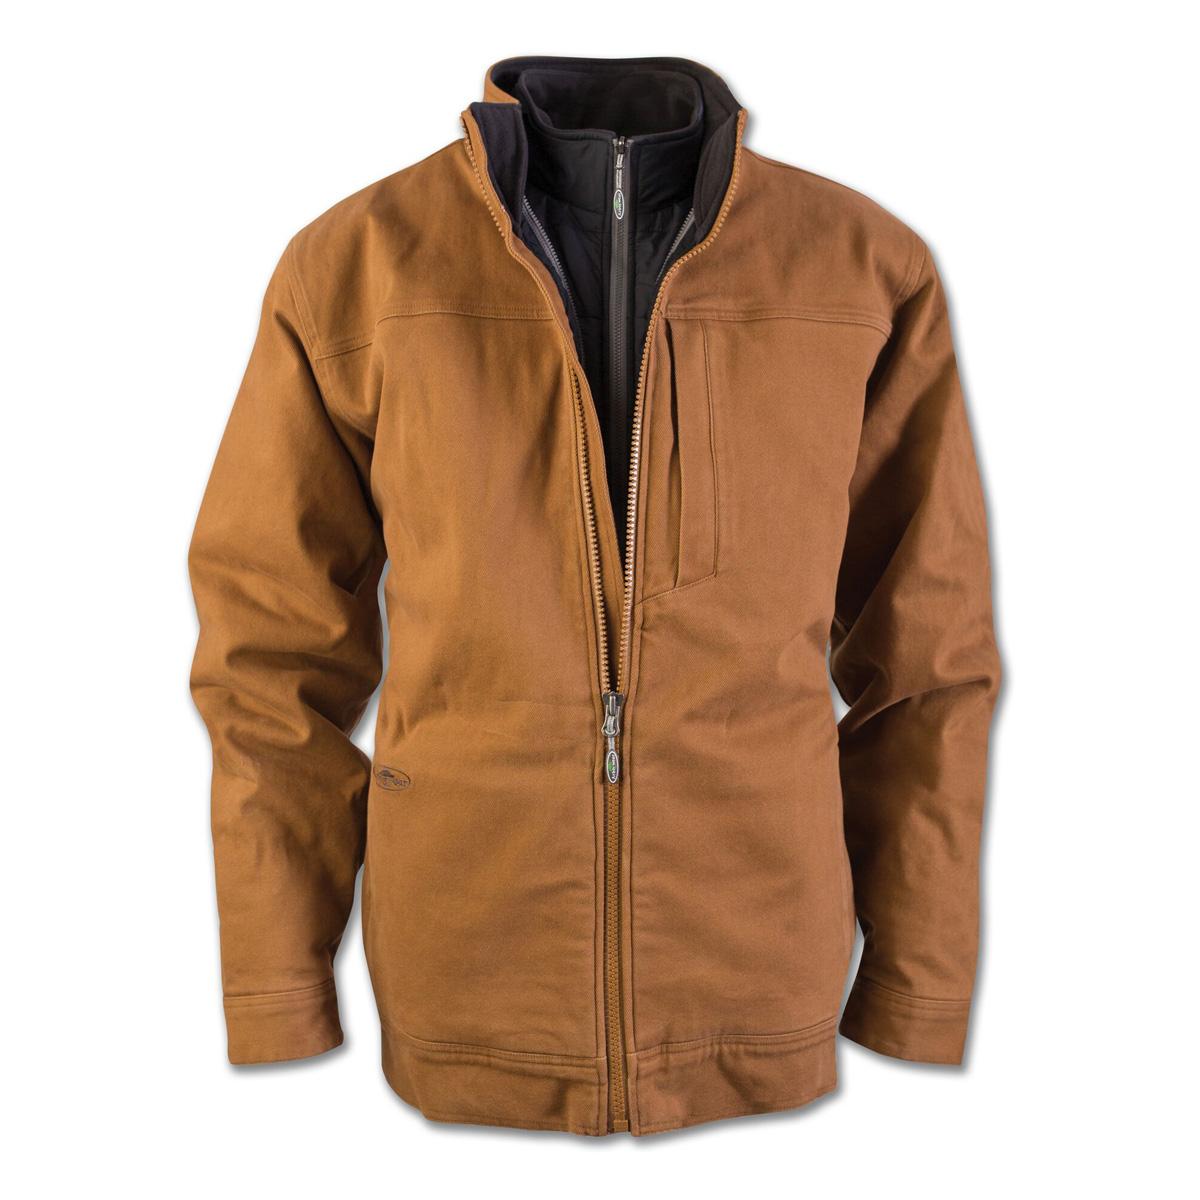 Arborwear Men's CedarFlex 3 In 1 Jacket